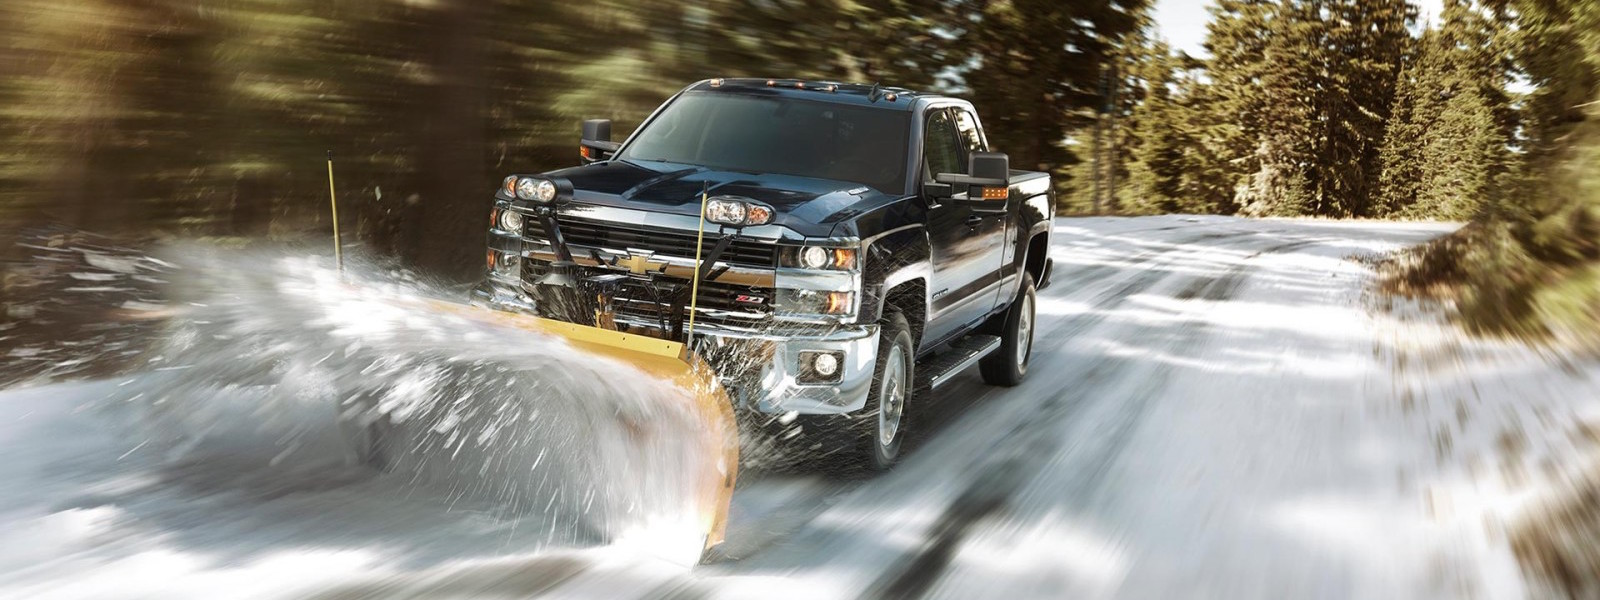 A black 2016 Chevy Silverado is plowing snow on a woodland road.